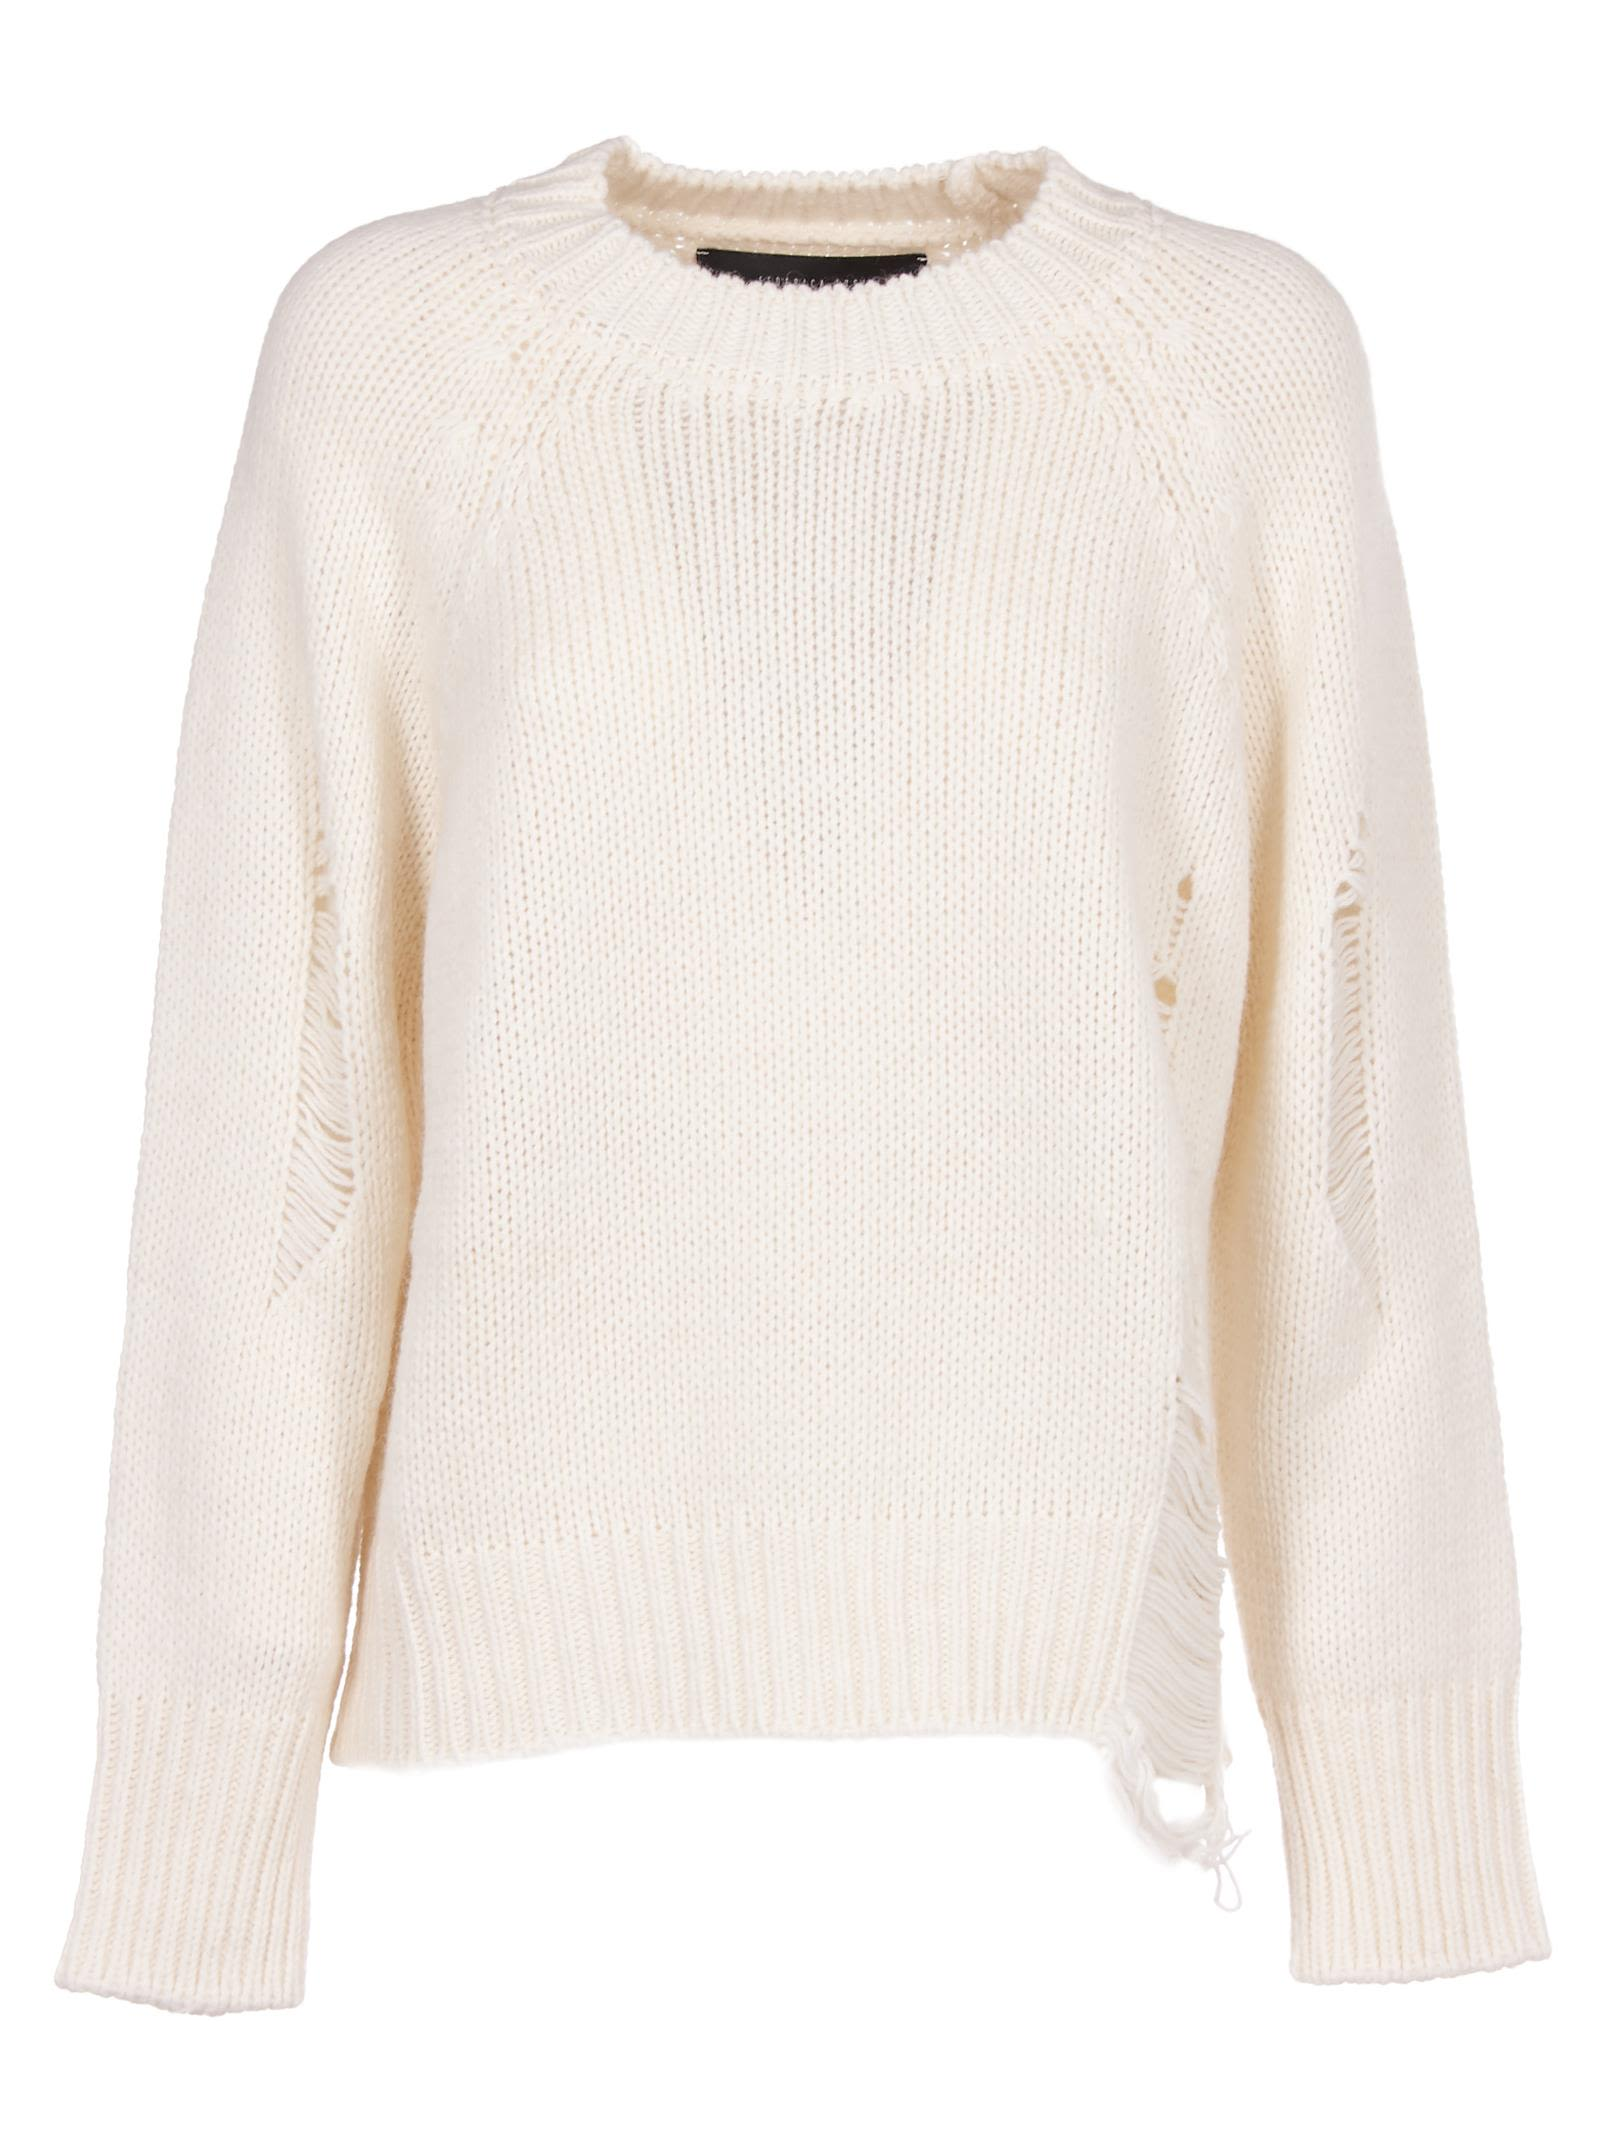 Federica Tosi Distressed Sweater